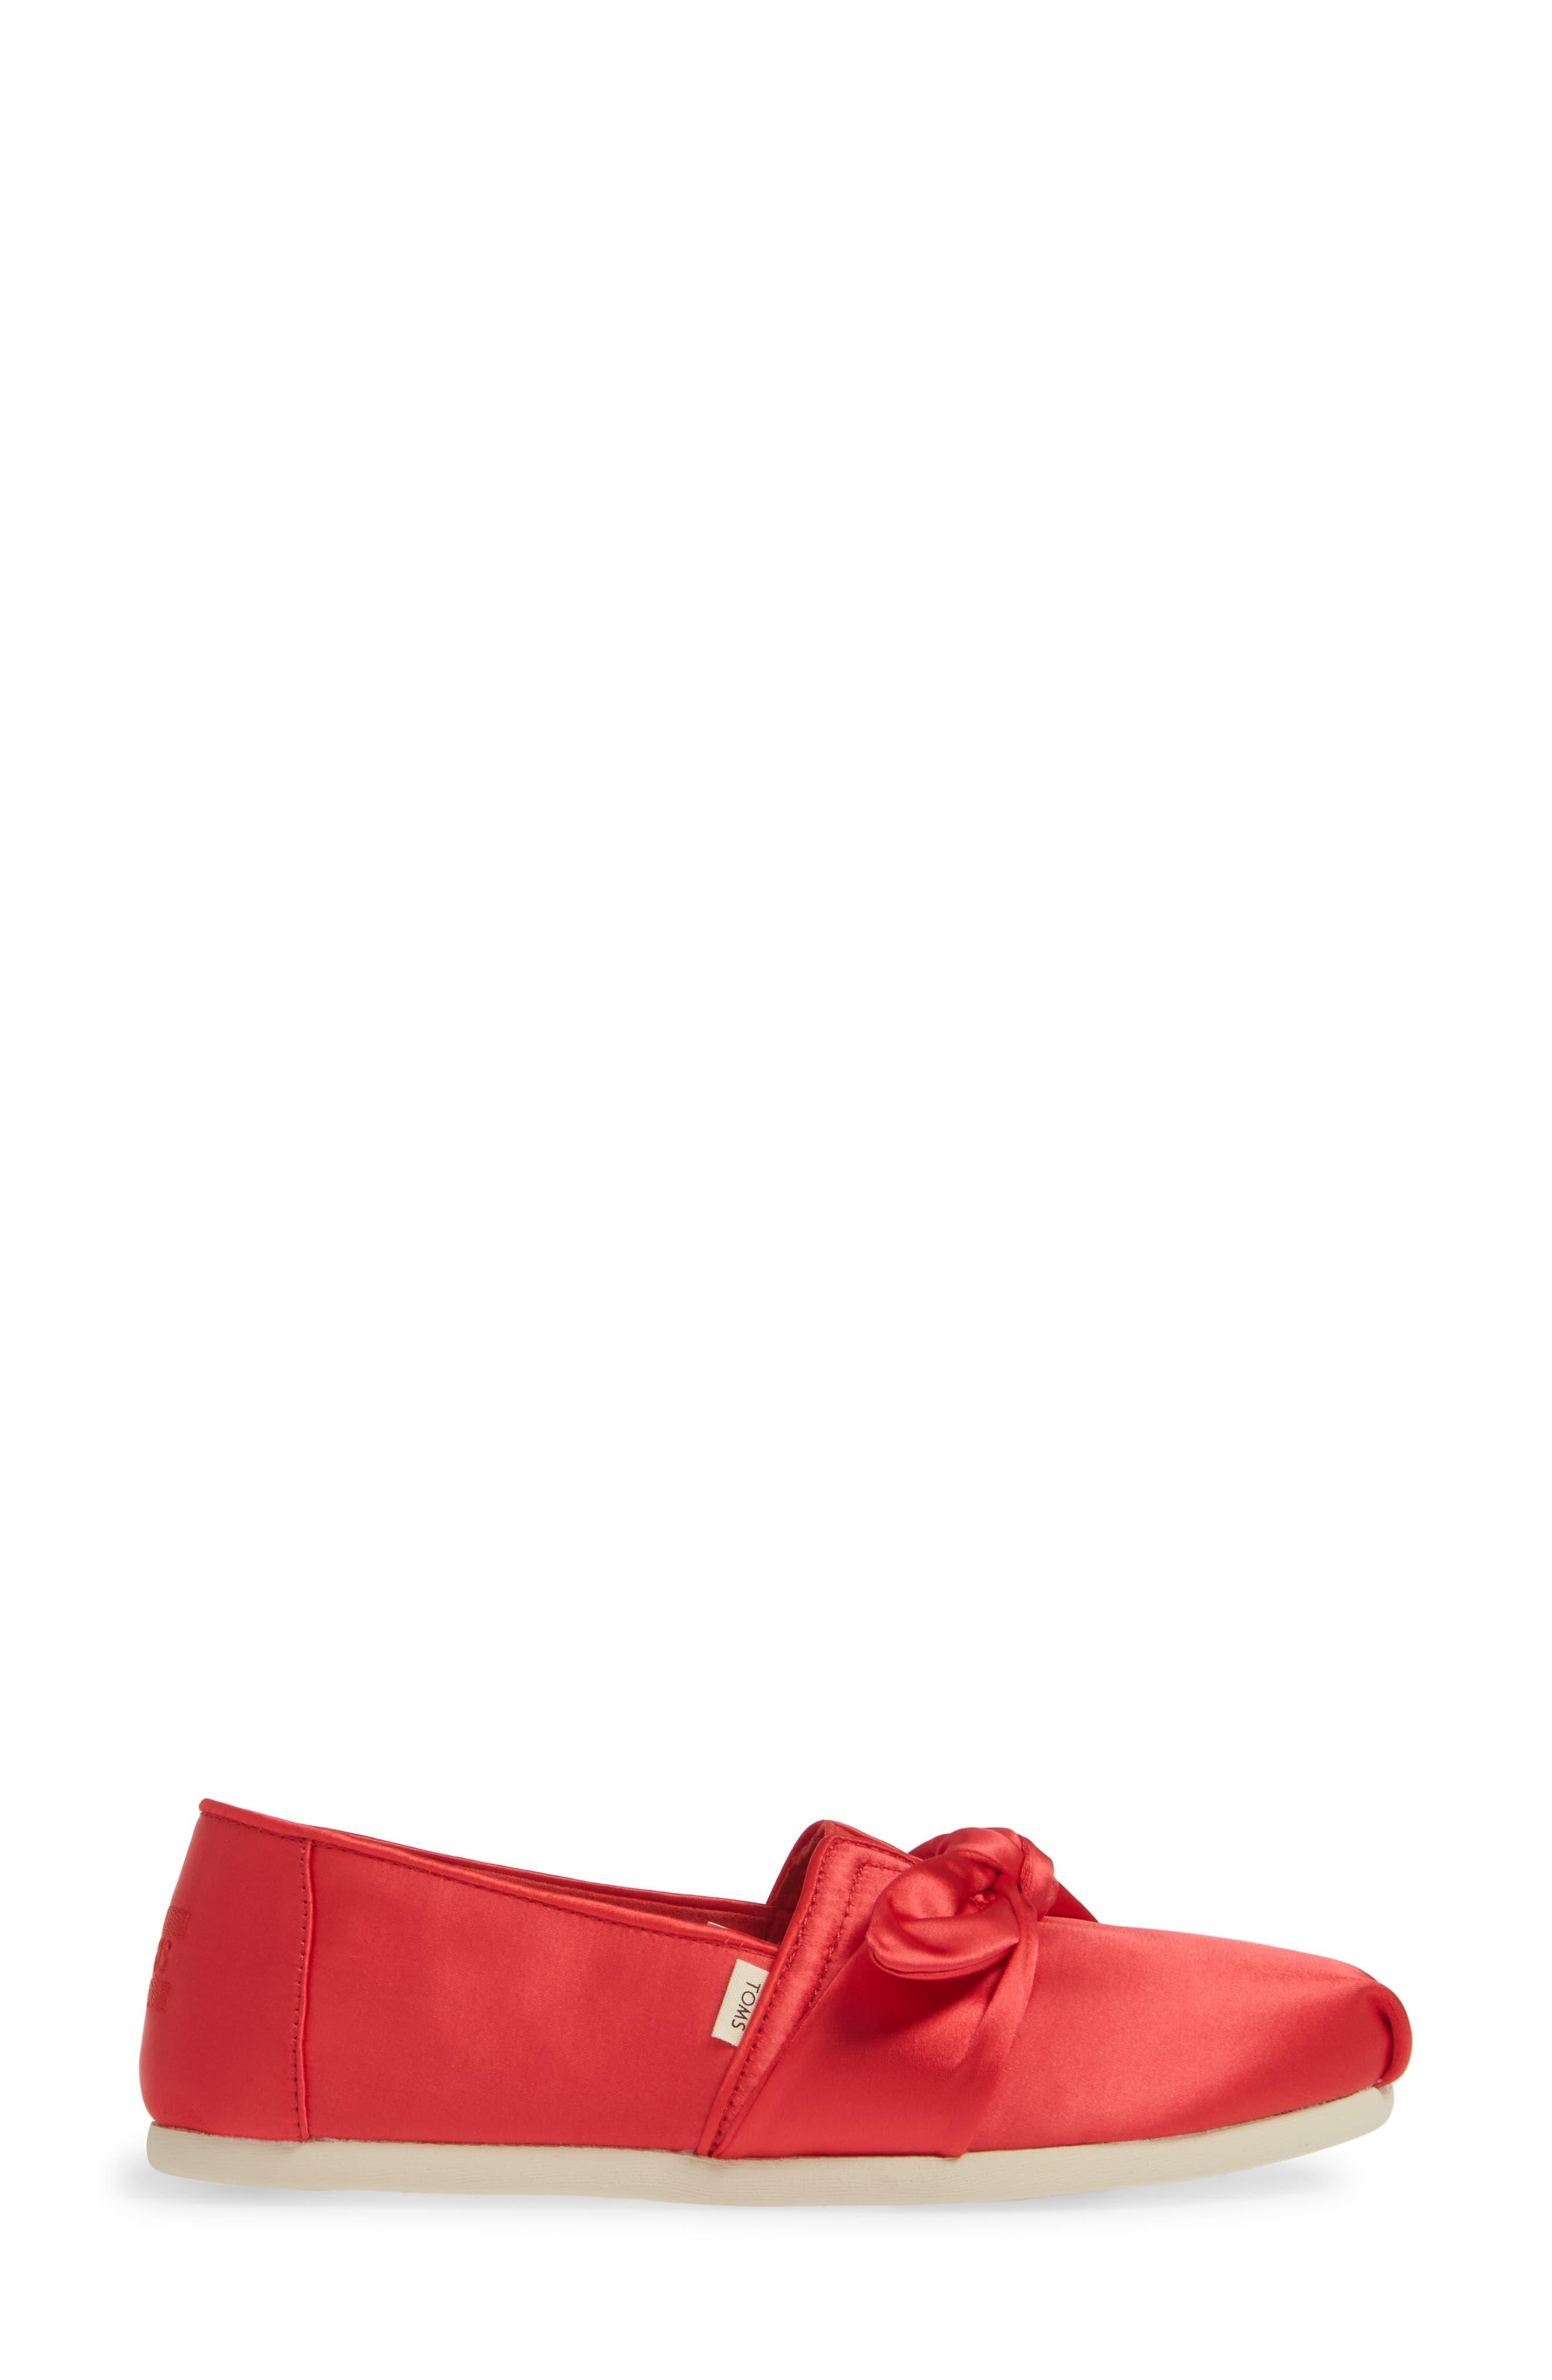 TOMS, Alpargata Bow Slip-On, Alternate thumbnail 3, color, RED LAVA FABRIC